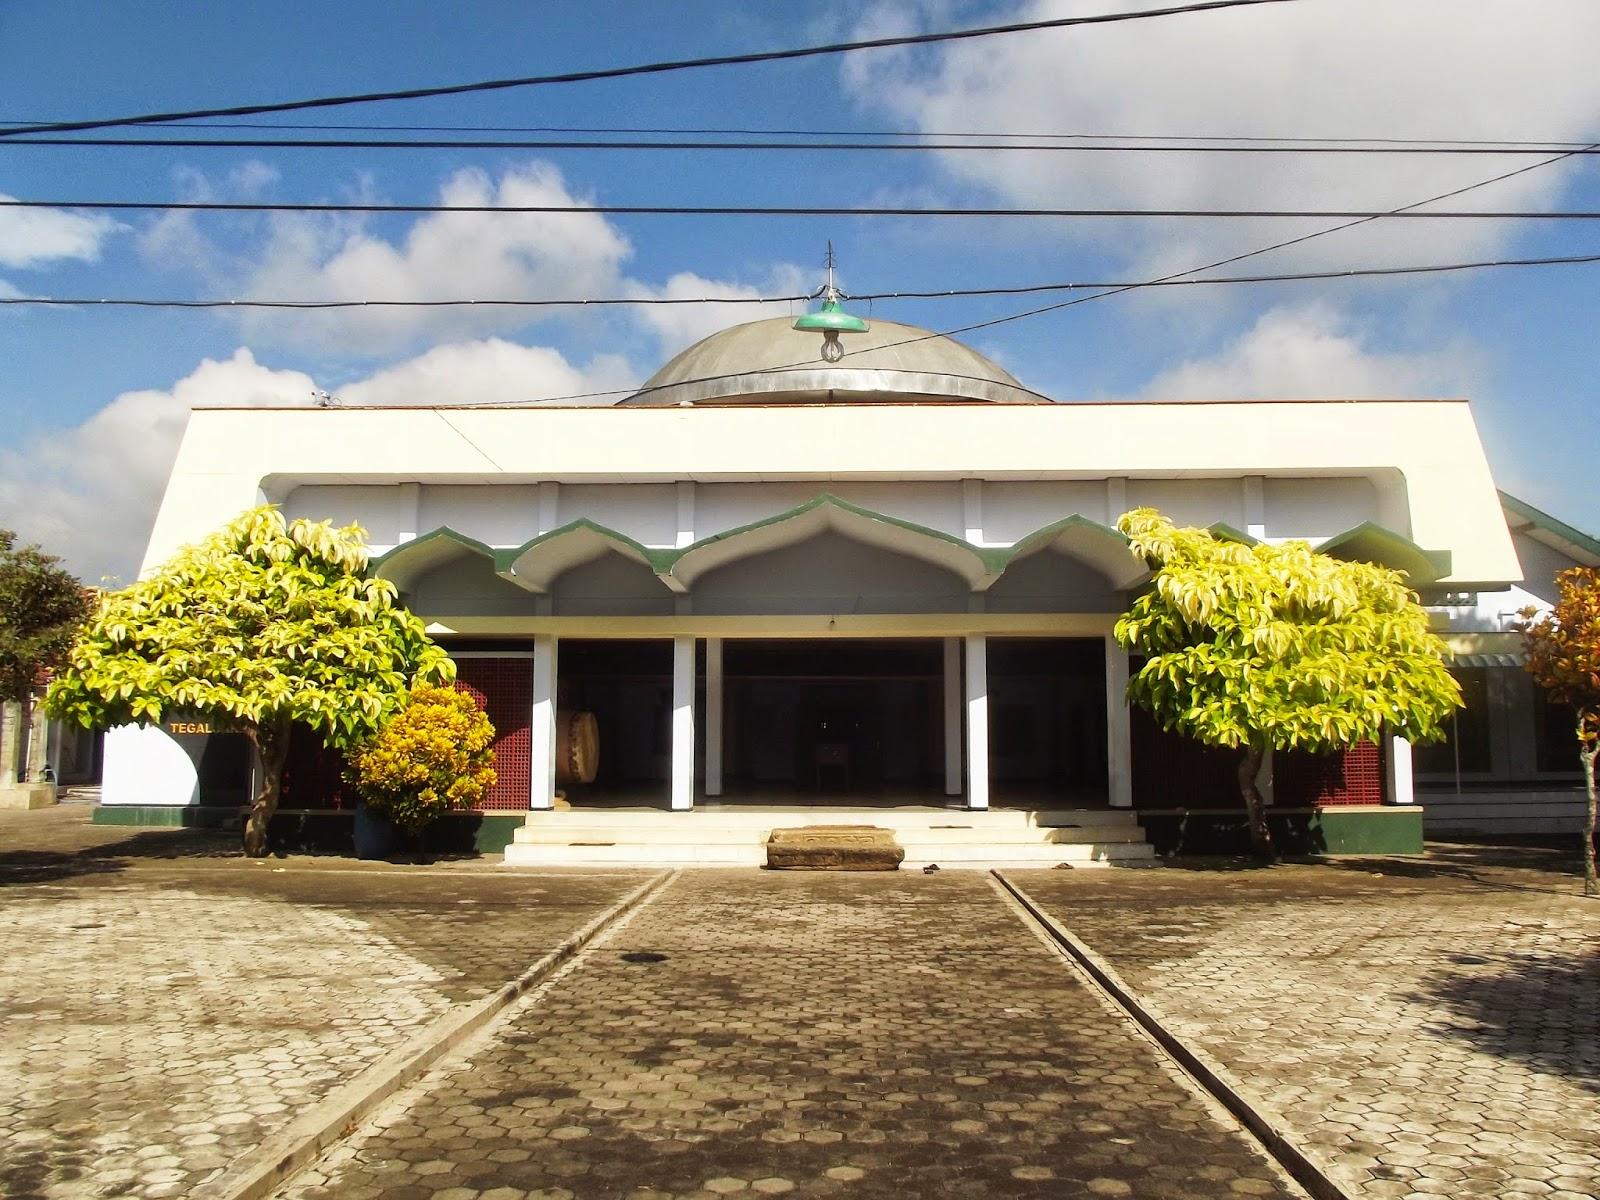 Wisata Religi Kab Ponorogo Masjid Tegalsari Vrci Terletak Desa Kecamatan